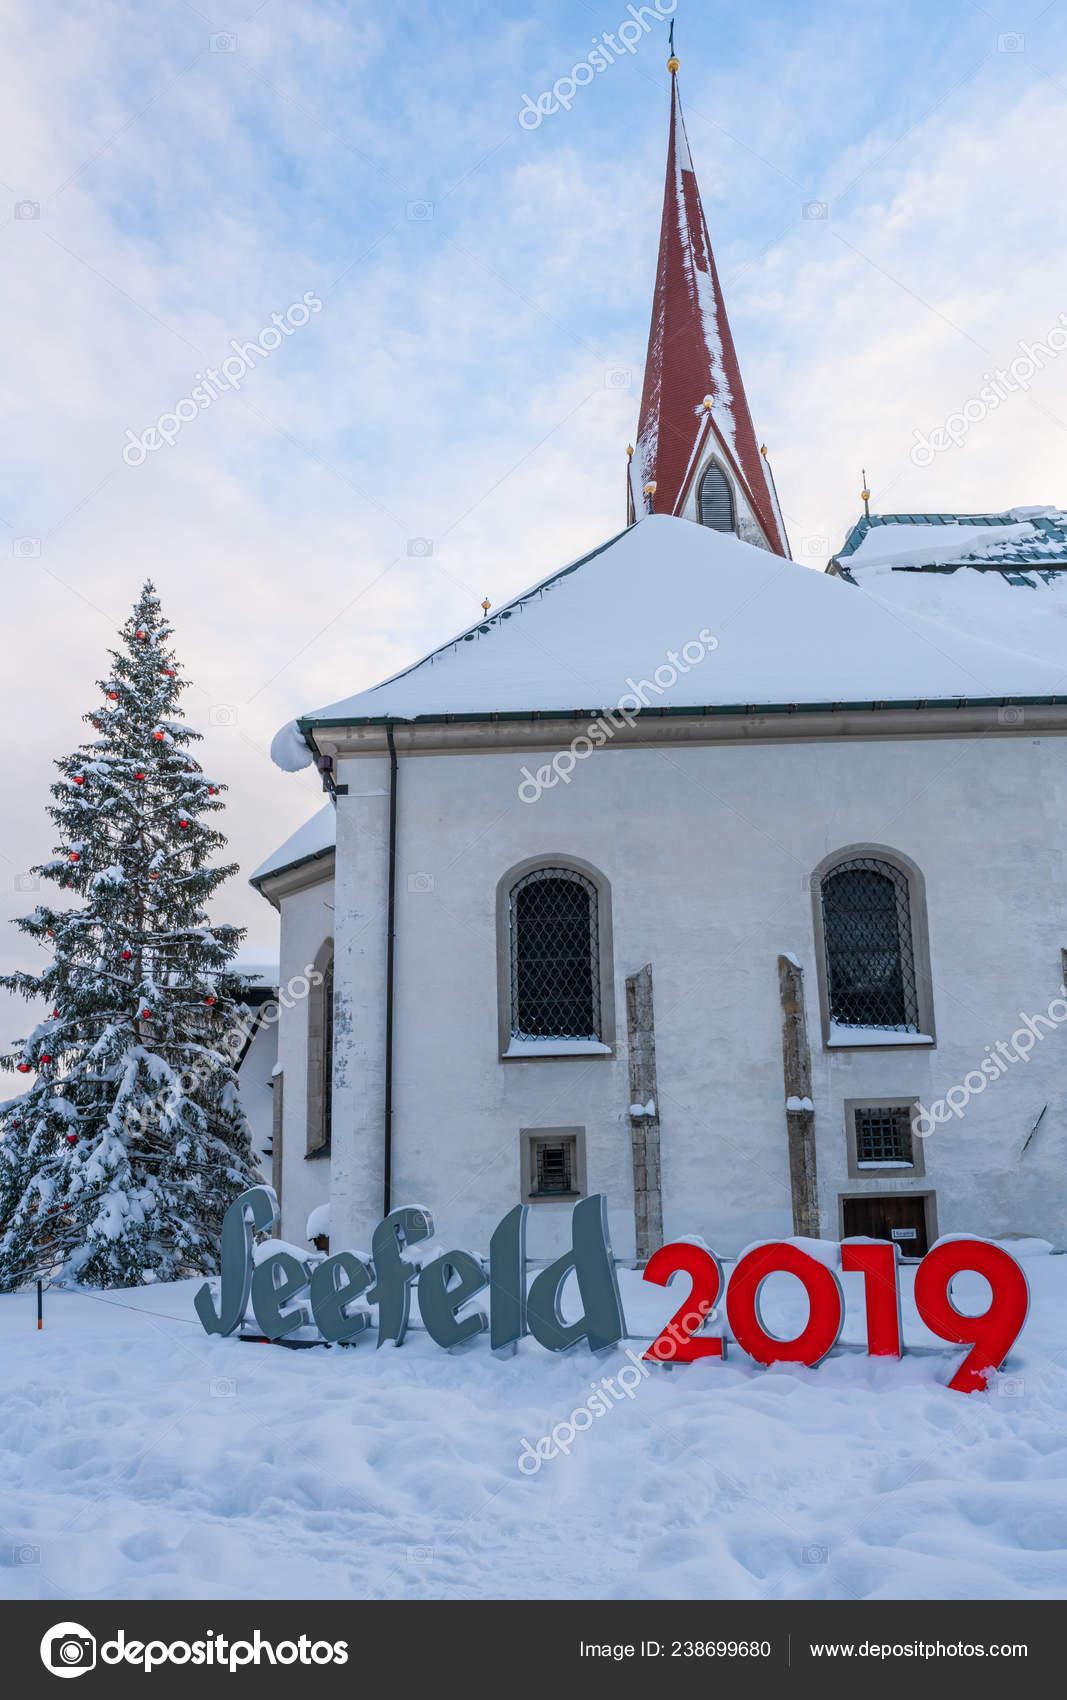 Christmas In Austria 2019.Seefeld Austria January 2019 View Oswald Parish Church